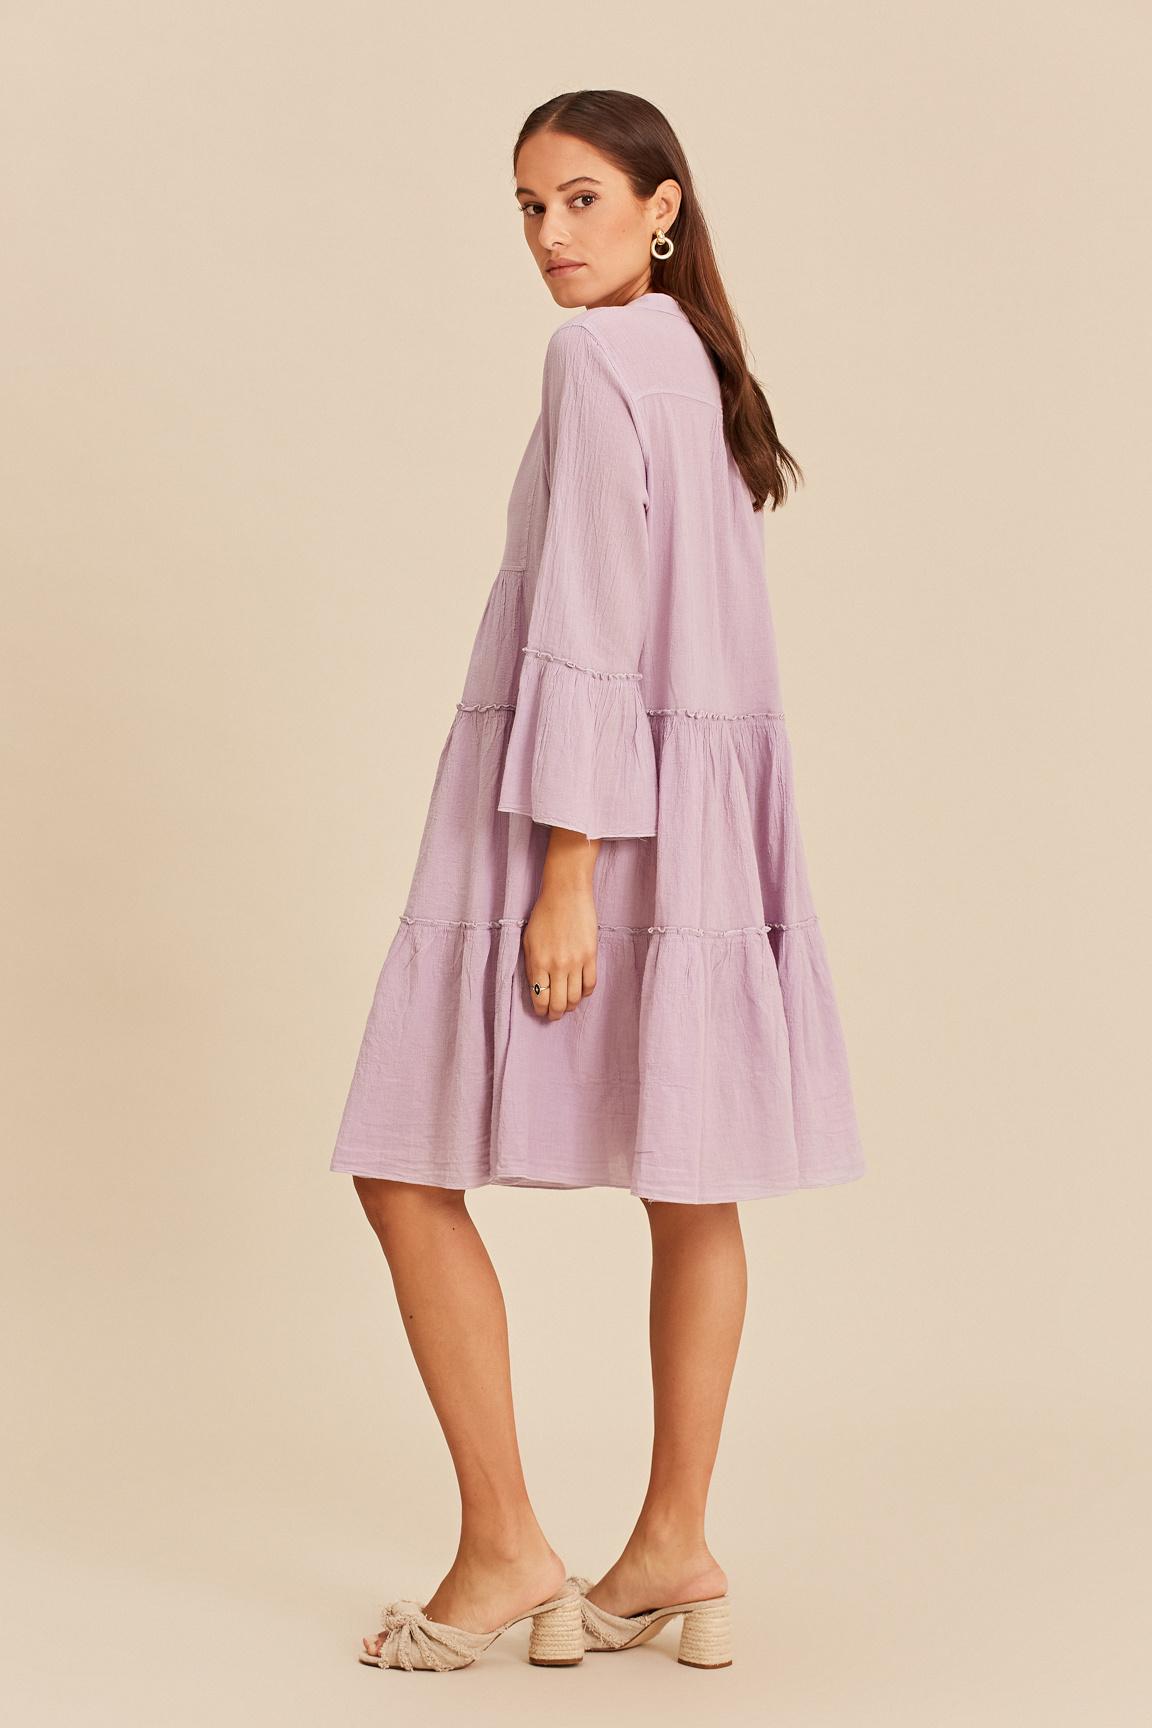 Dress Midi - Khaki-3